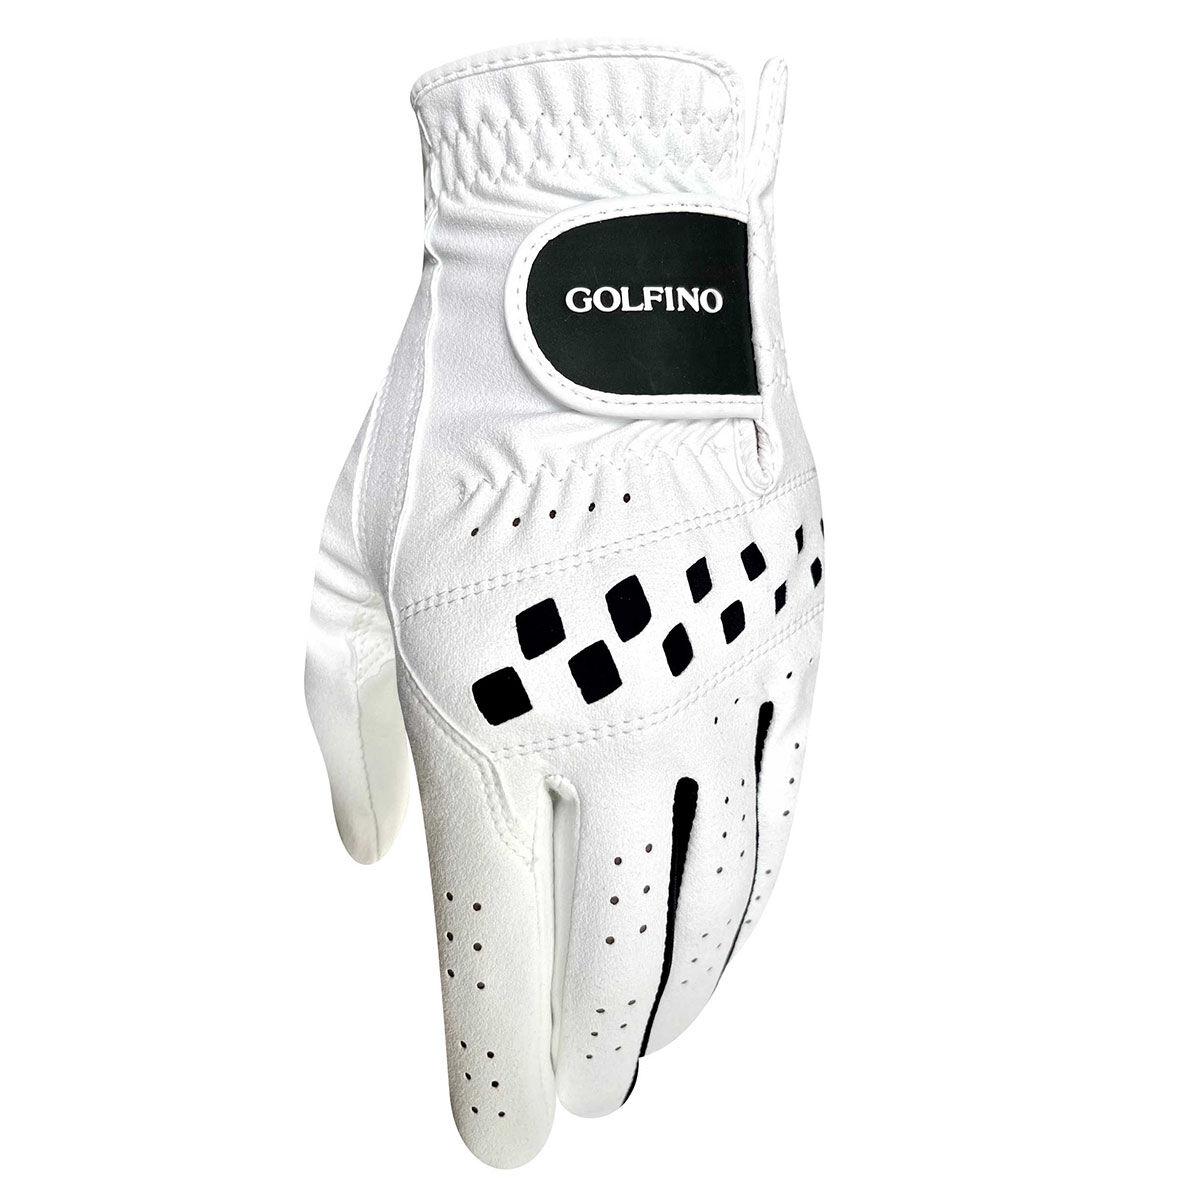 GOLFINO All Weather Hybrid Golf Glove, Mens, Left hand, Large, White/black | American Golf